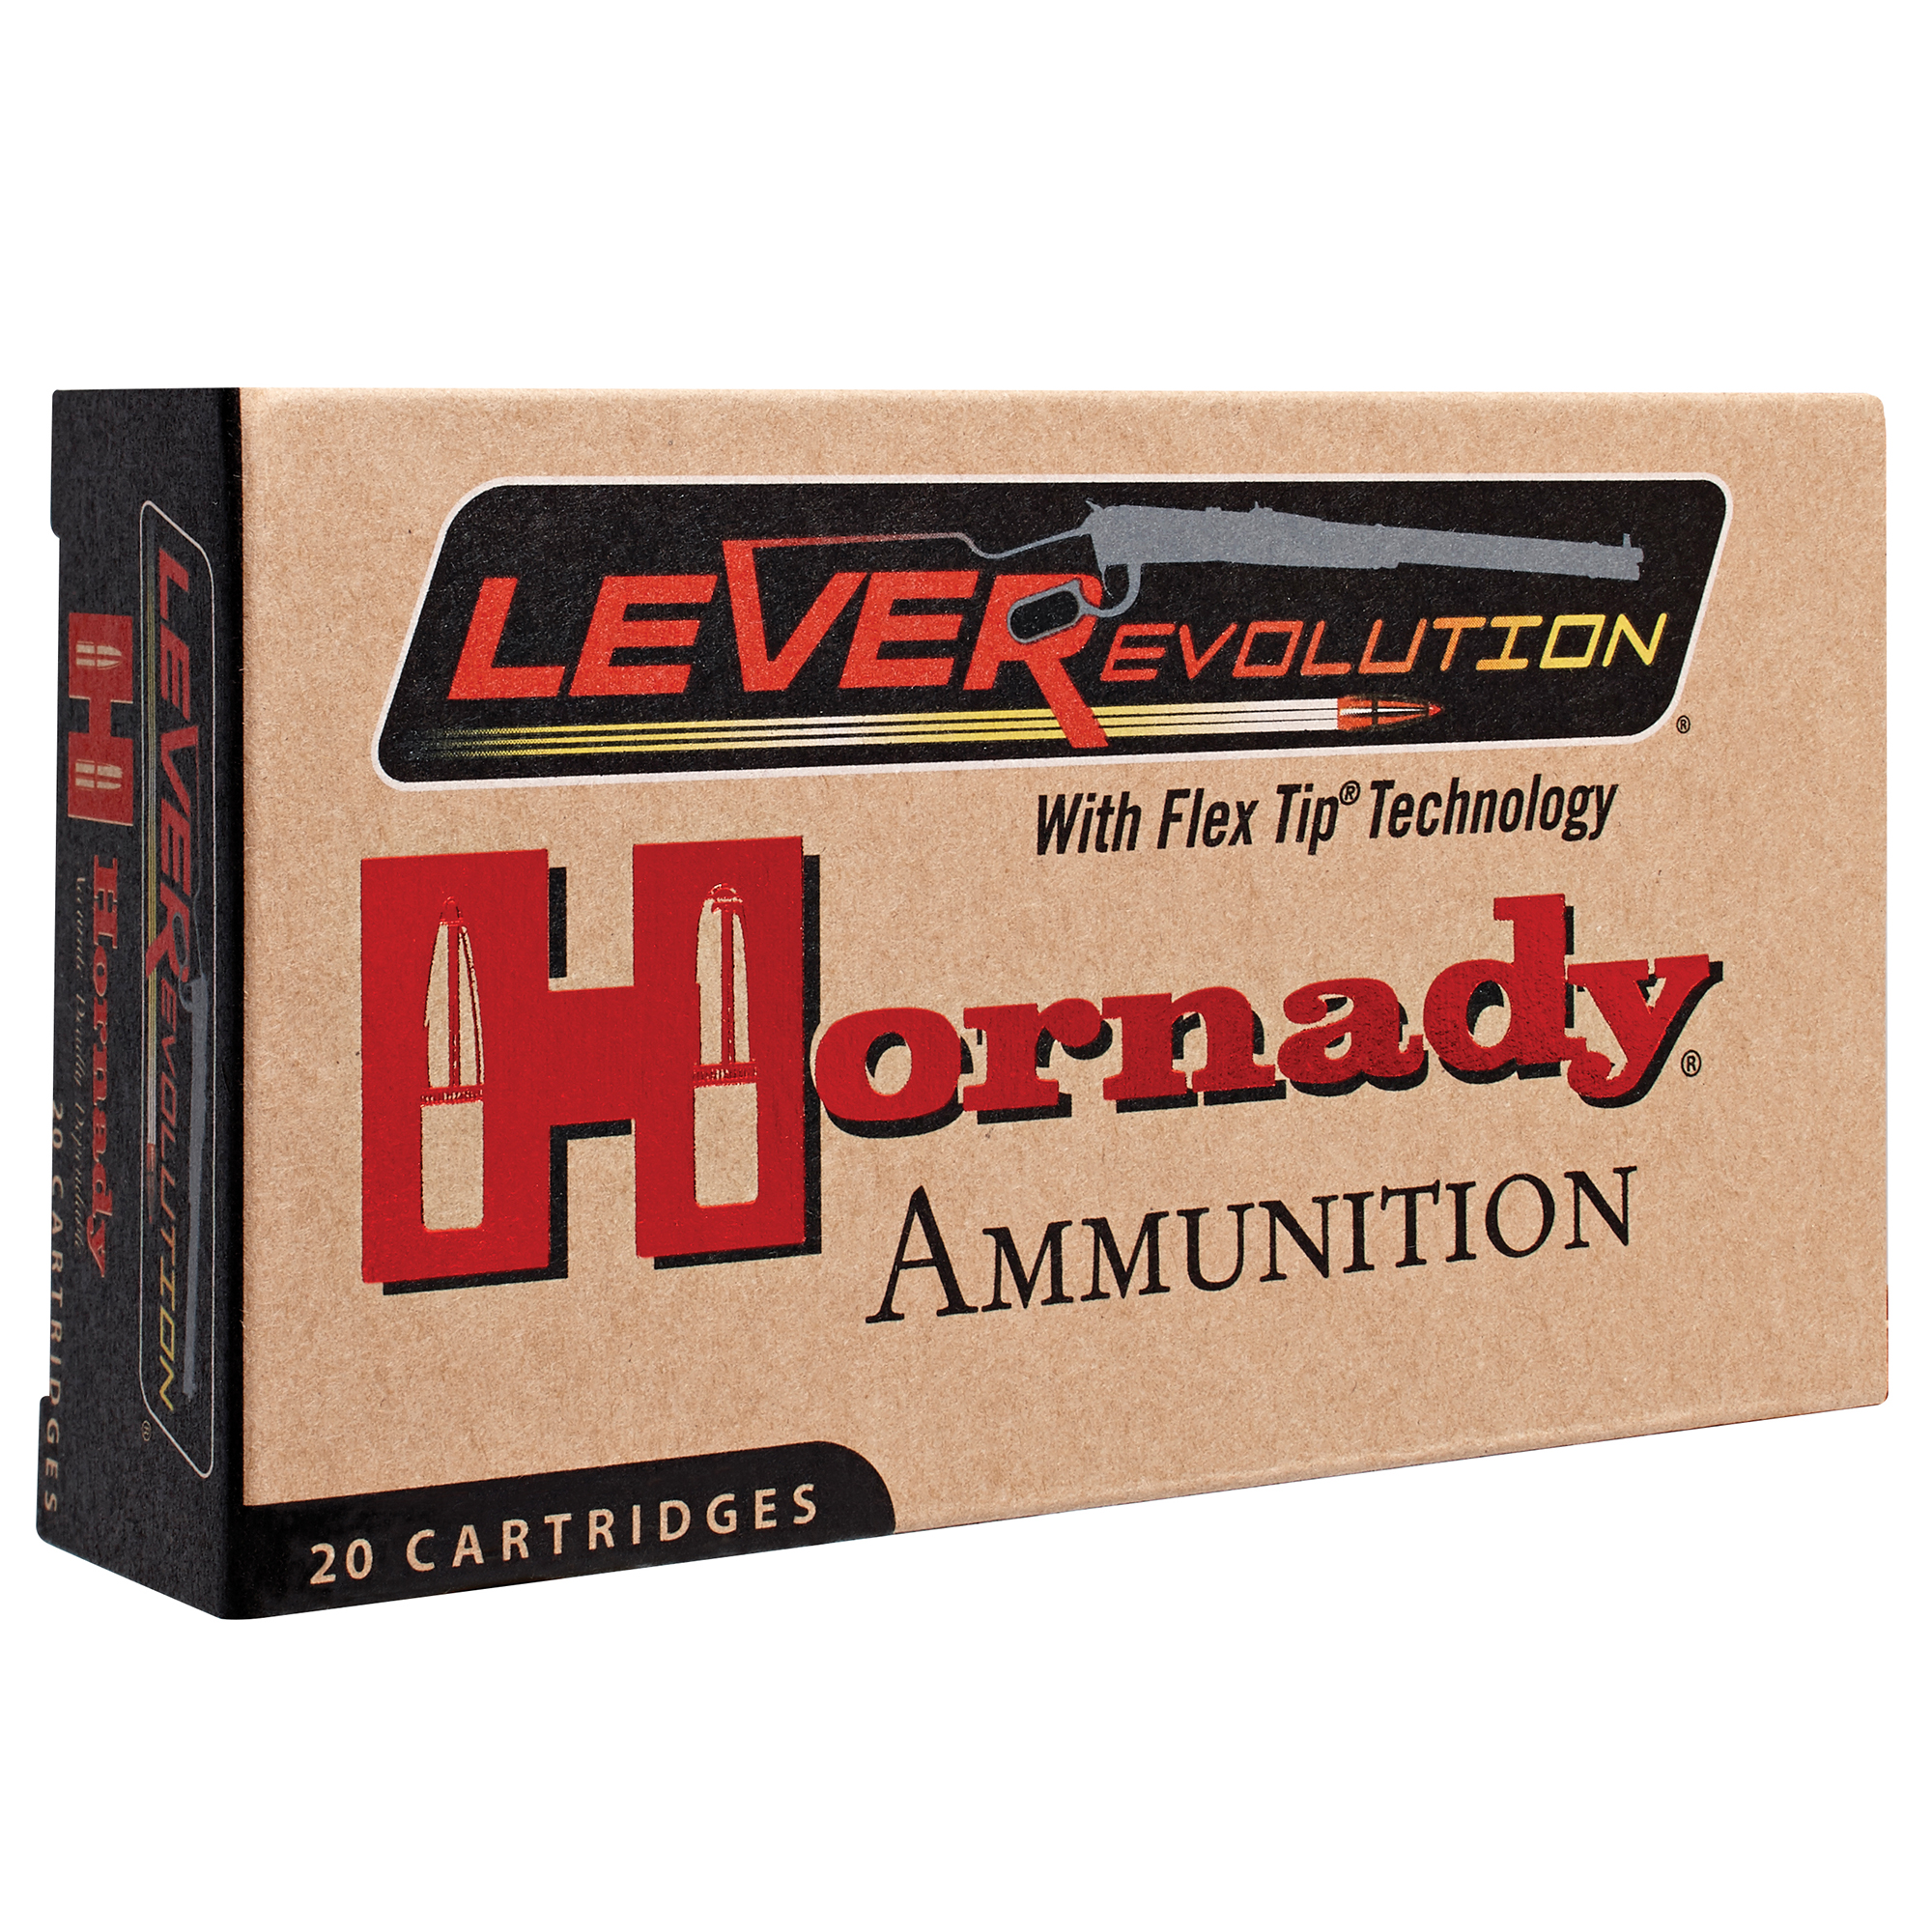 Hornady LEVERevolution Rifle Ammunition, .450 Marlin, 325-gr, FTX